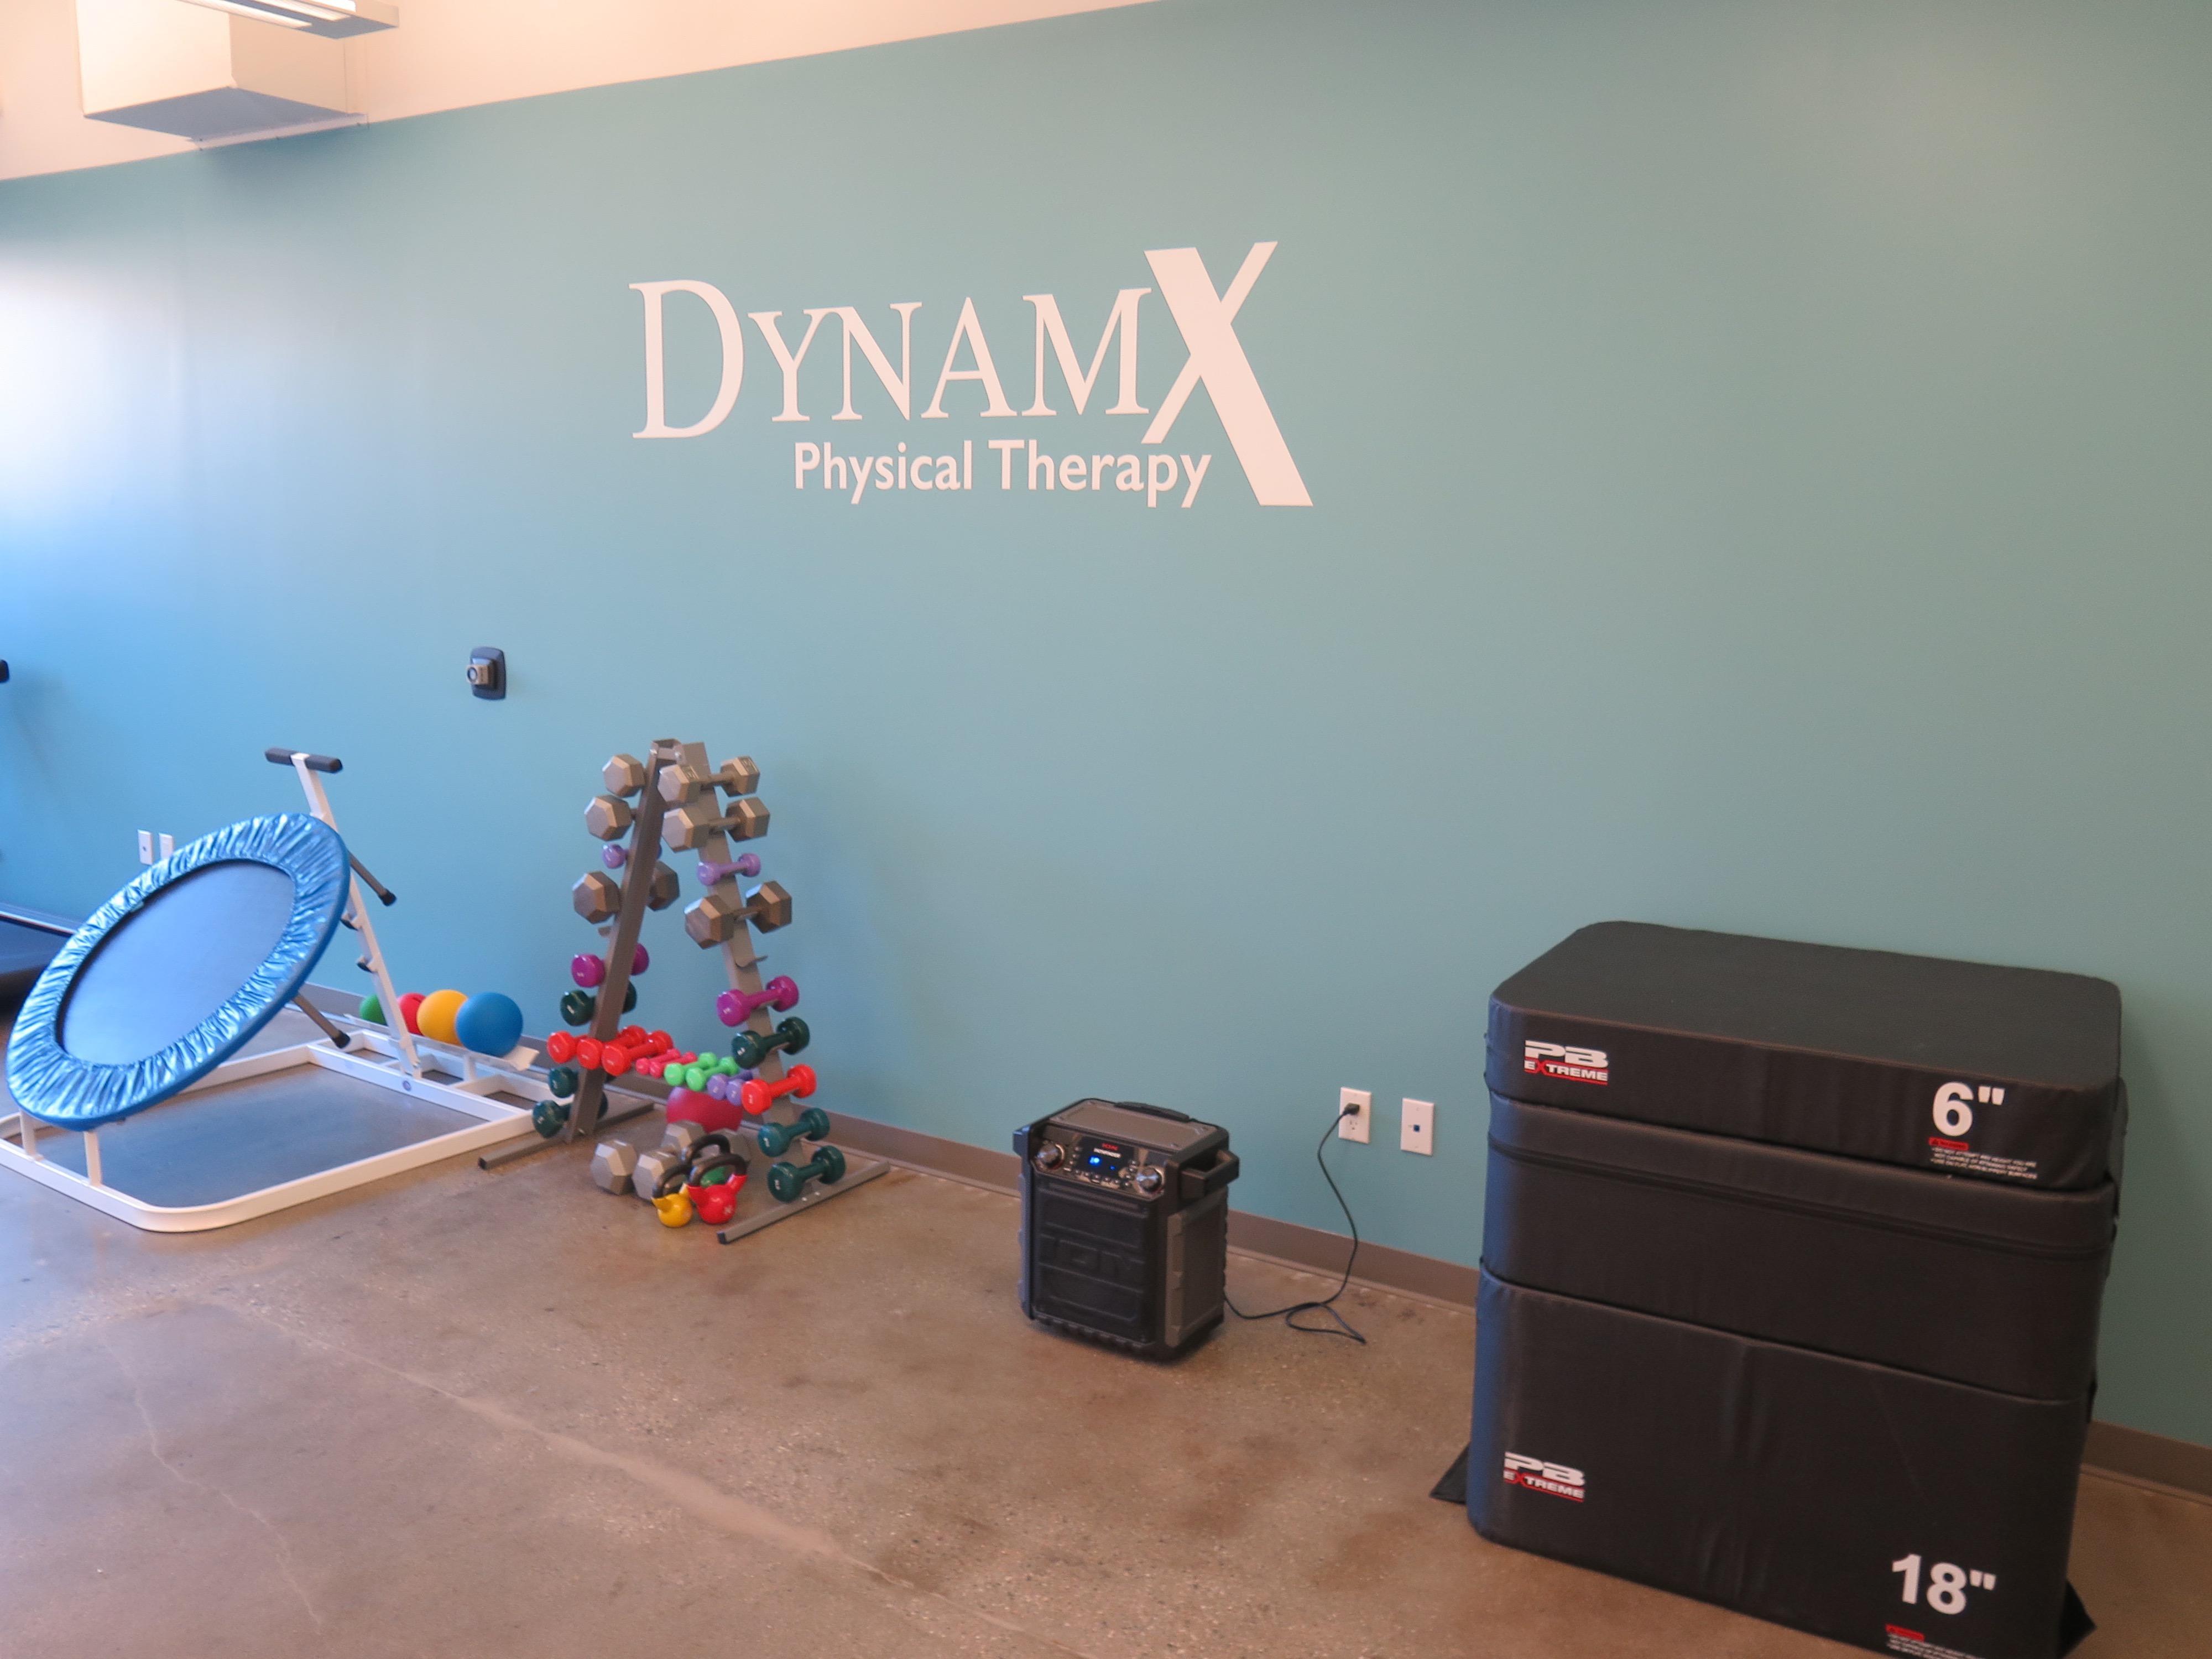 DynamX Physical Therapy Santa Monica image 1